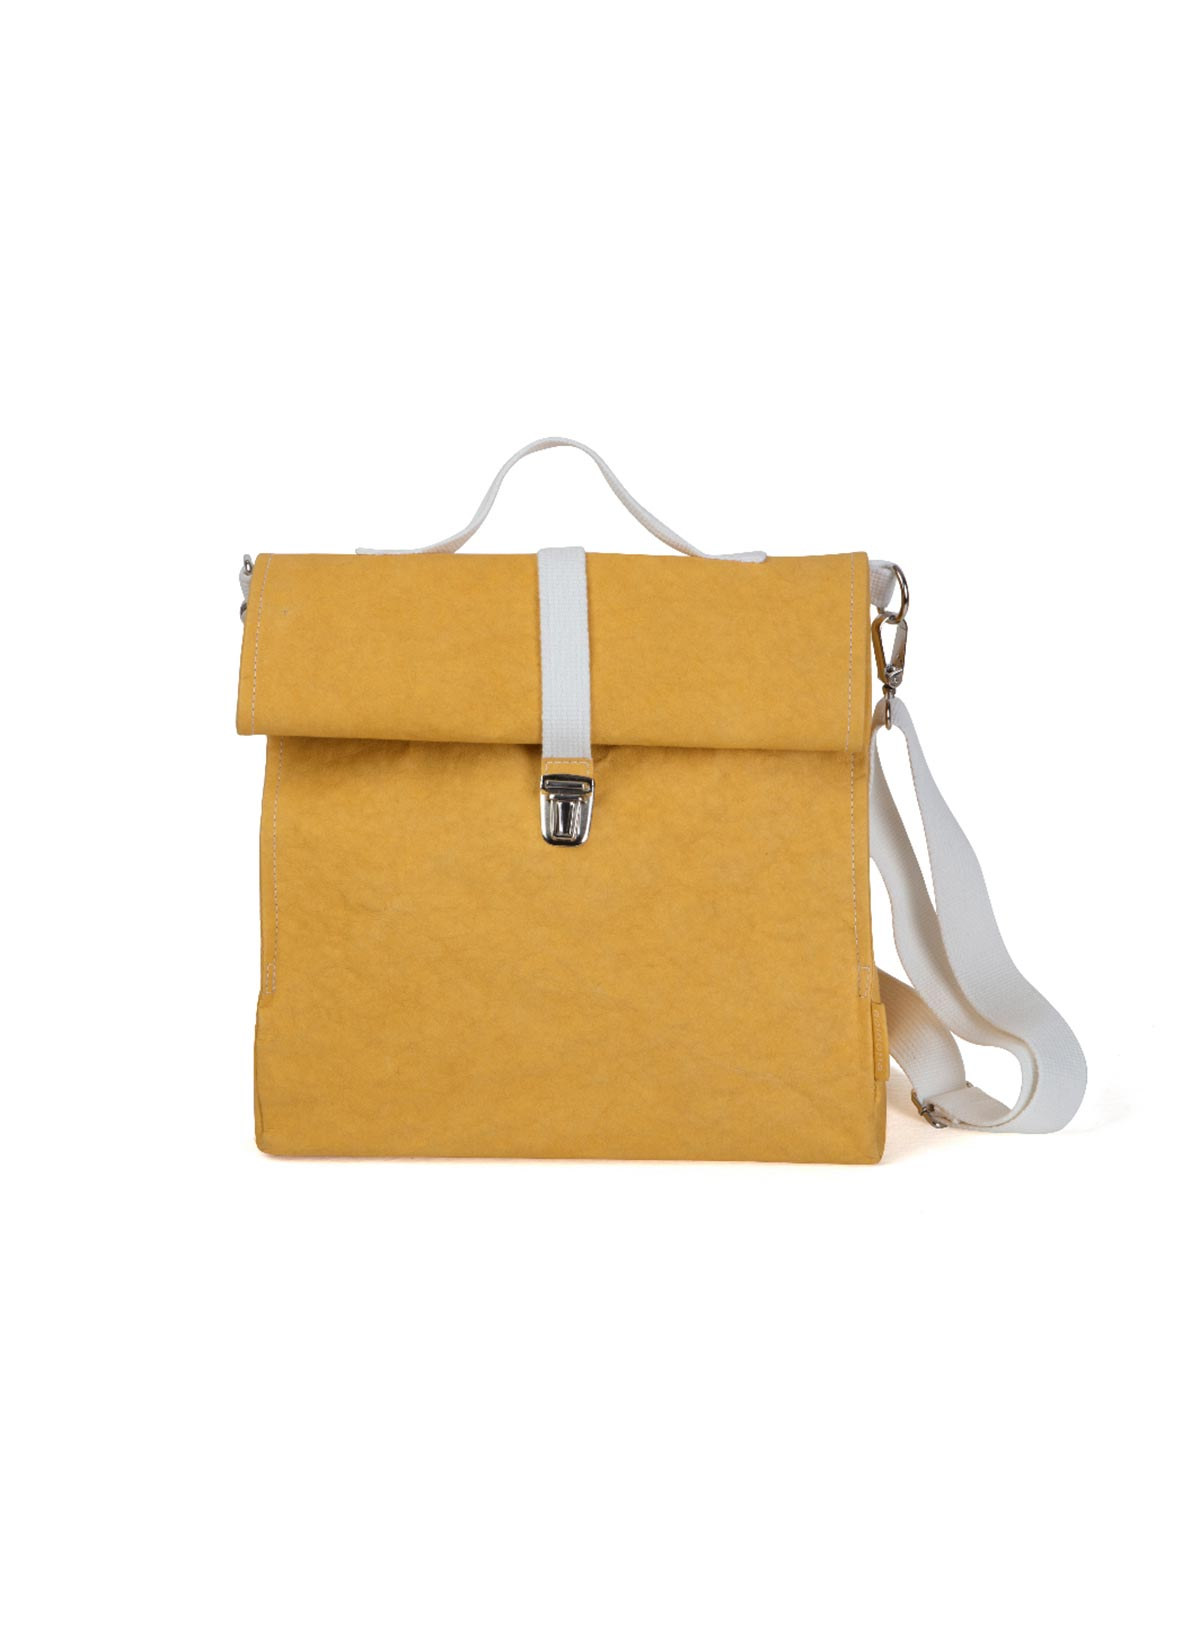 Lunch Bag Mustard